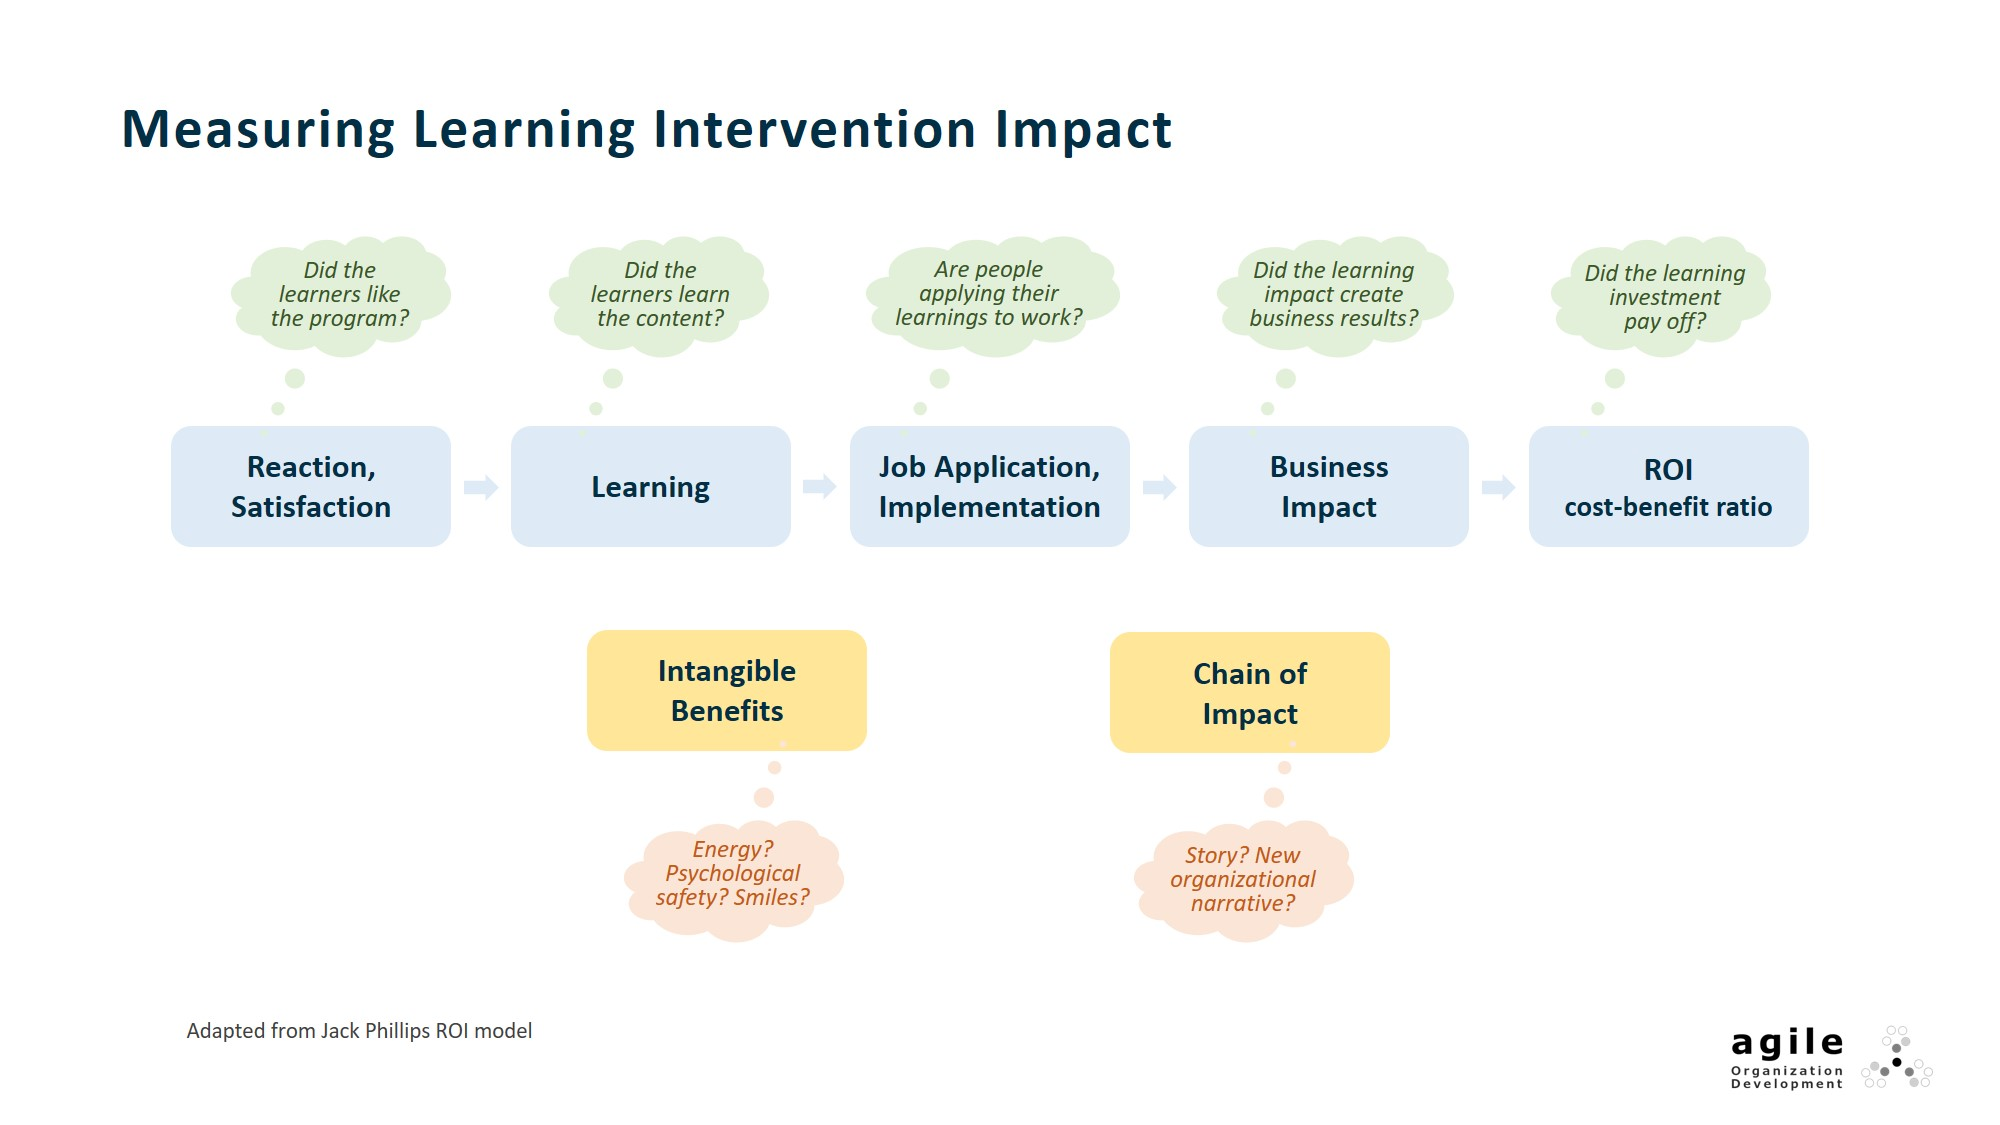 Phillips ROI model for measuring intervention efficacy